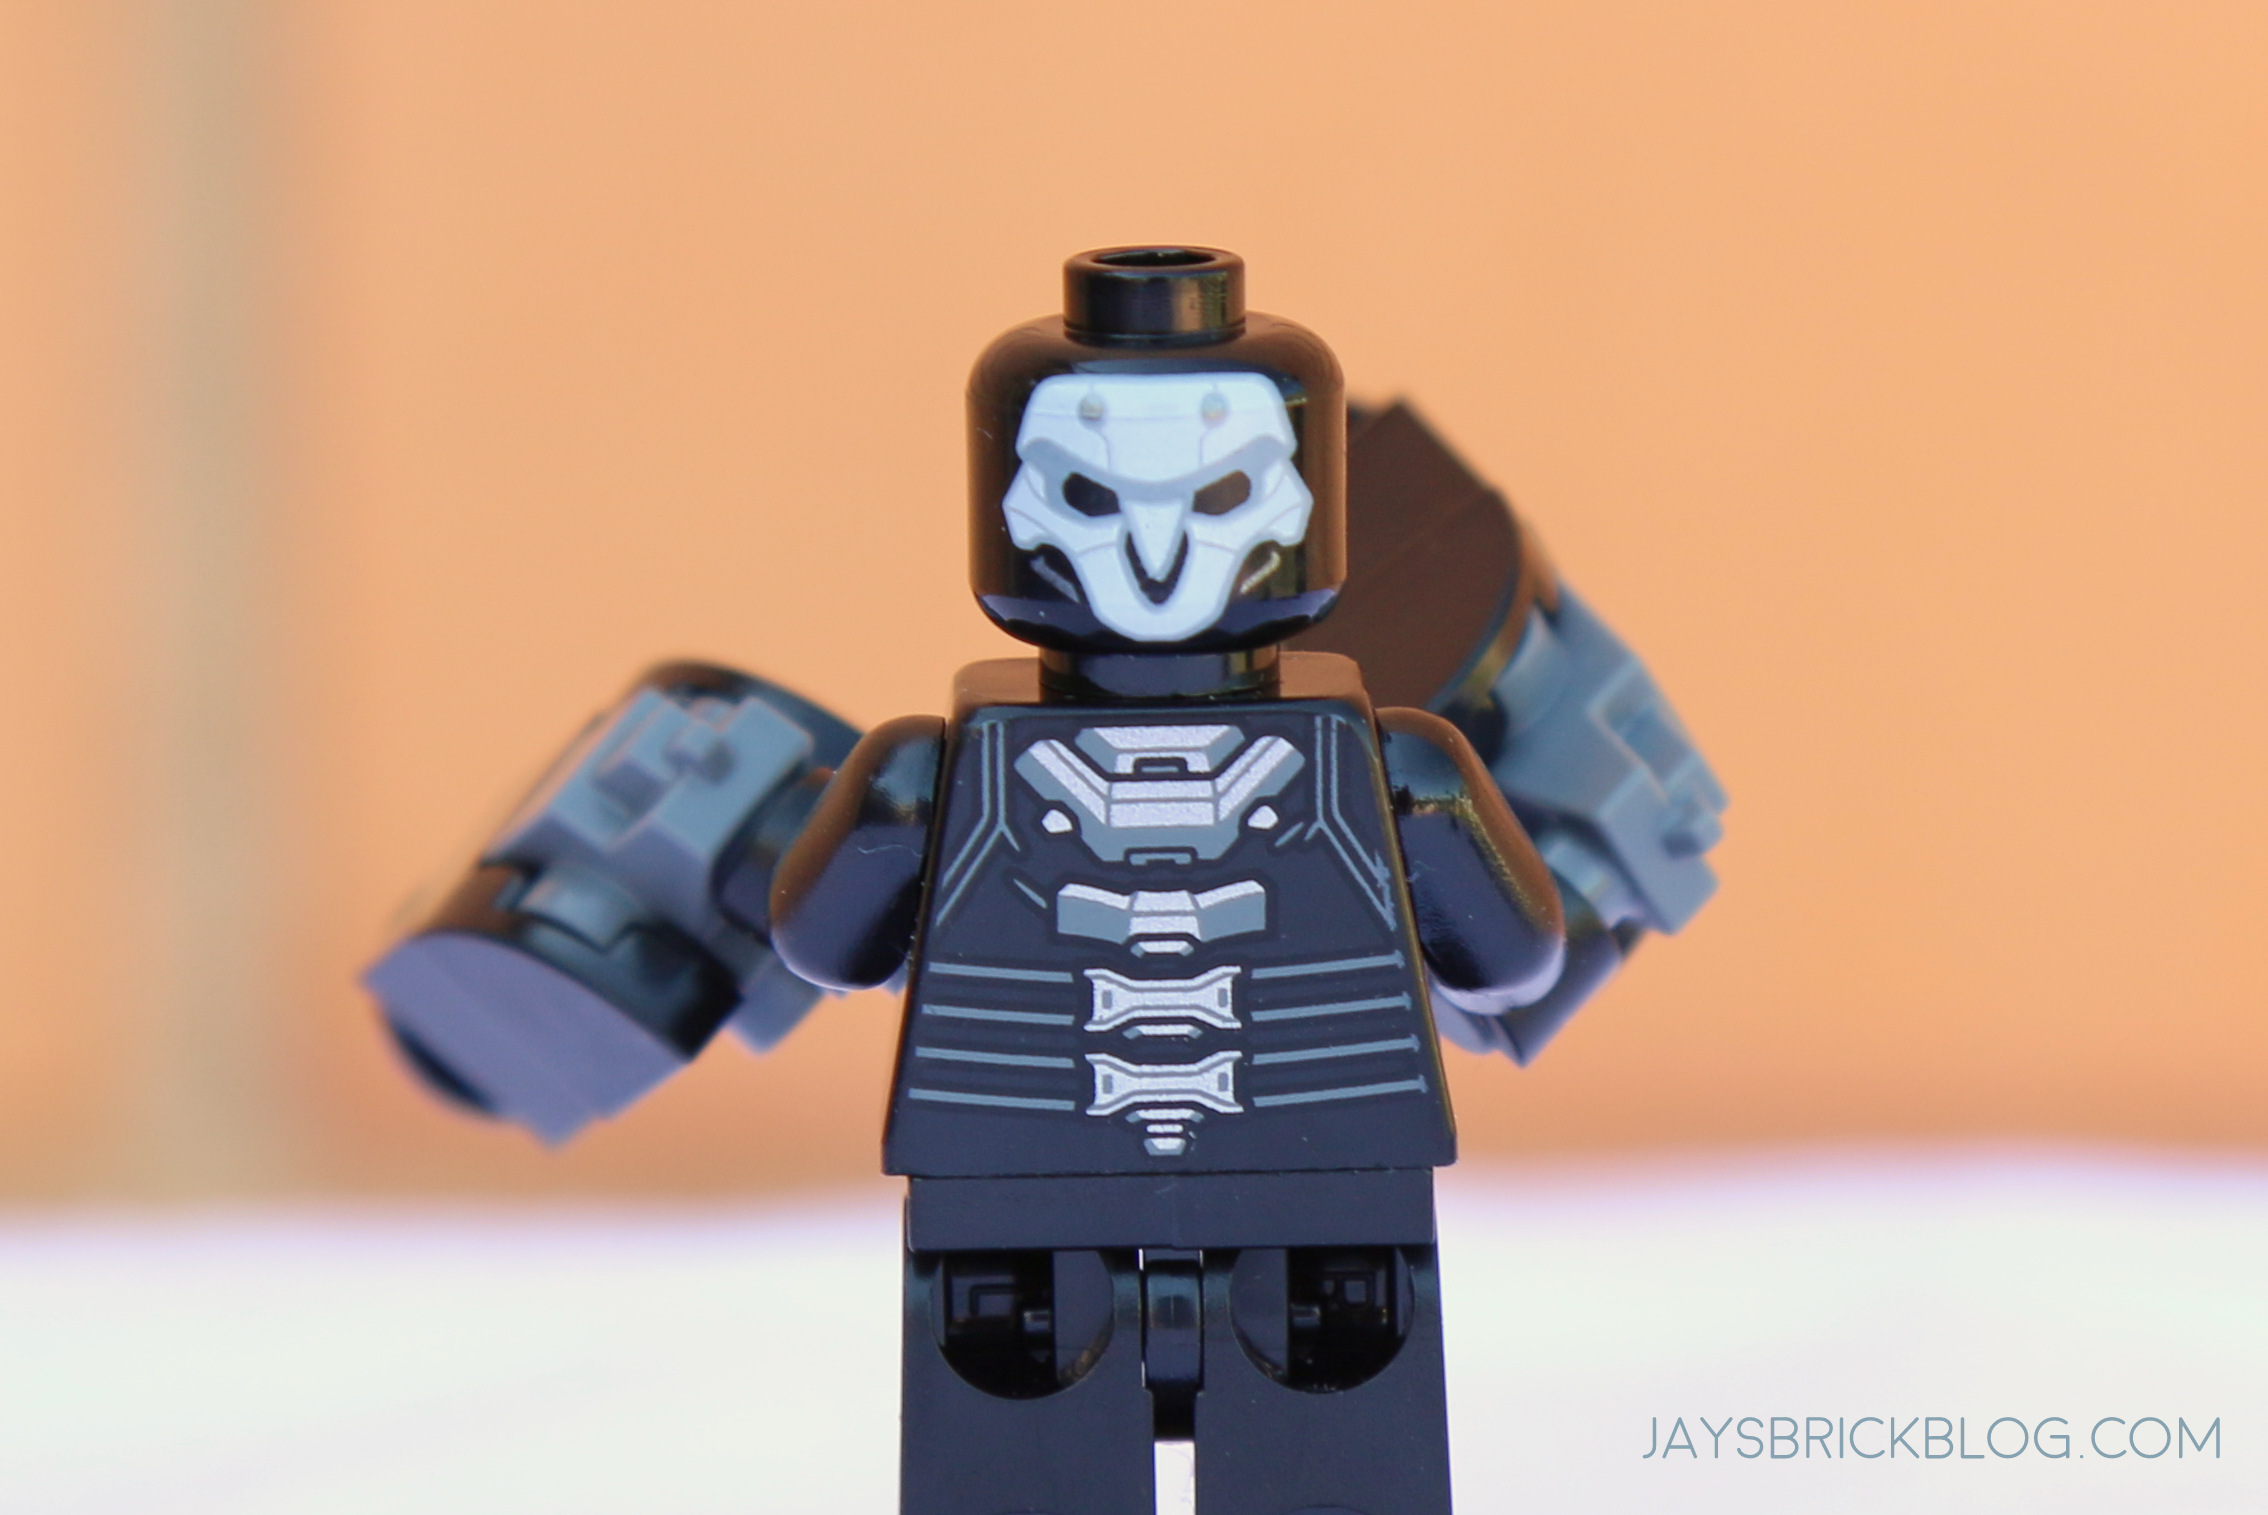 LEGO Overwatch Reaper Minifigure 75972 Mini Fig